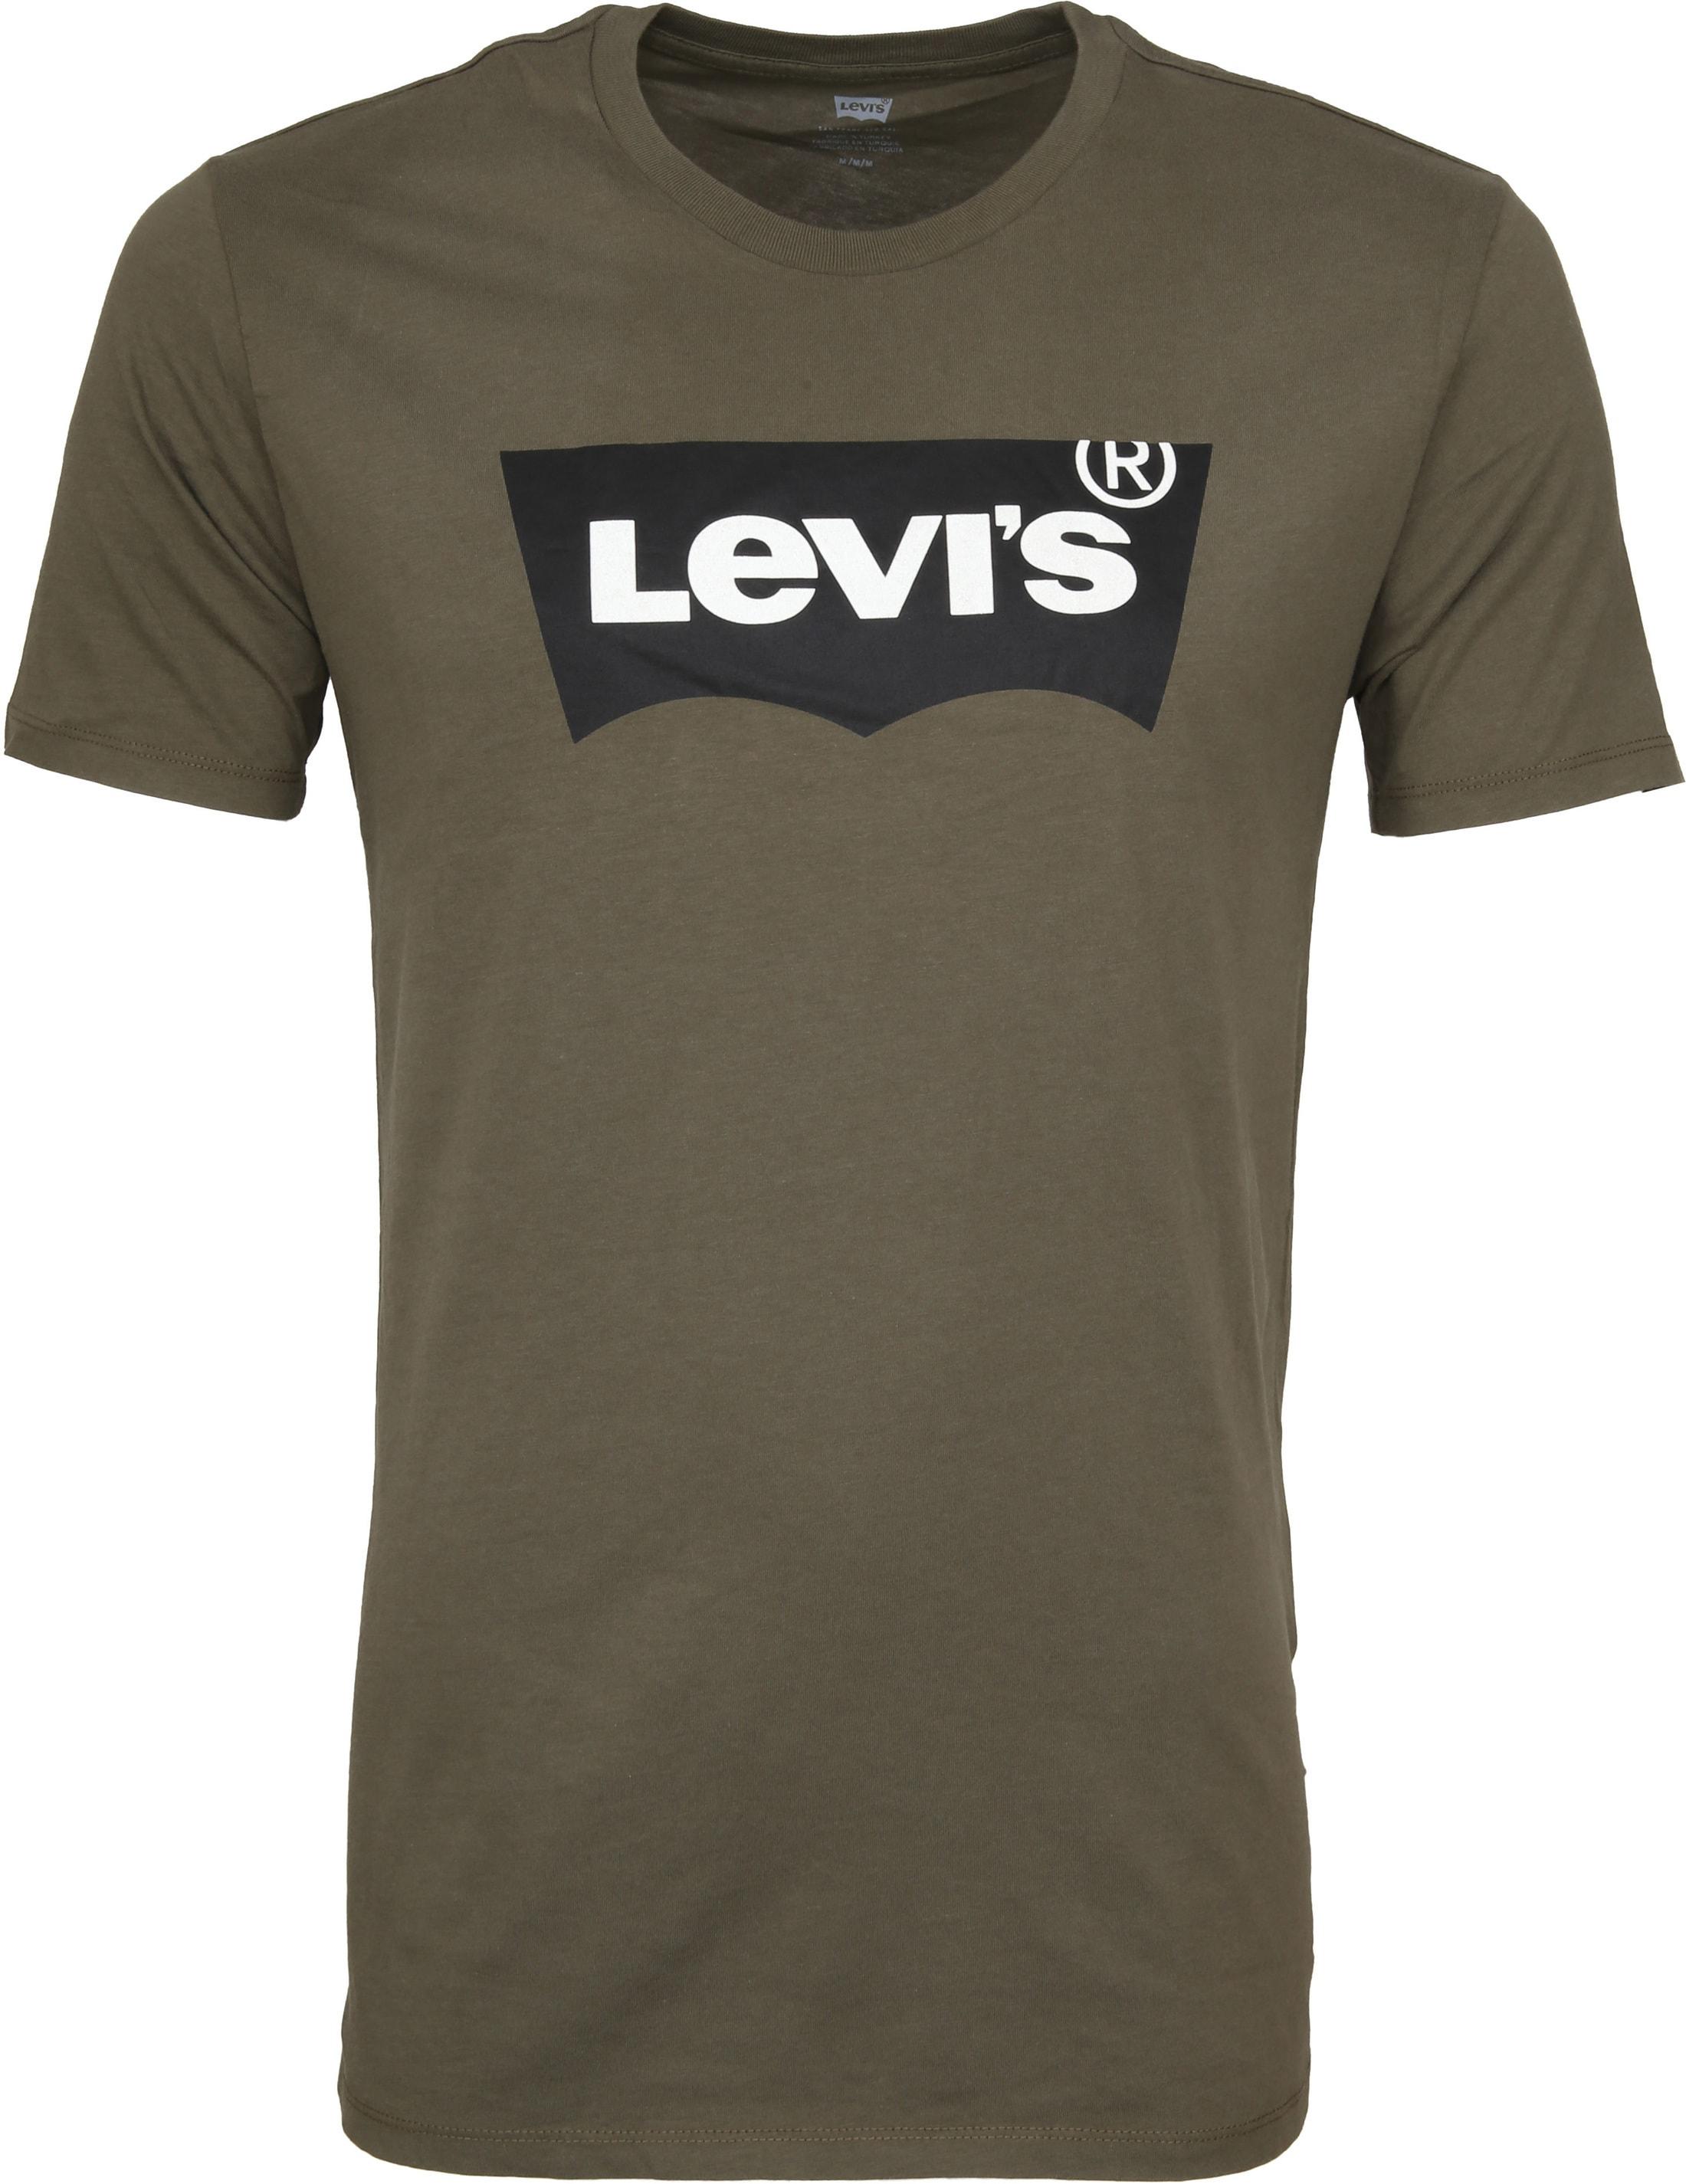 Levi's T-shirt Groen Logo foto 0